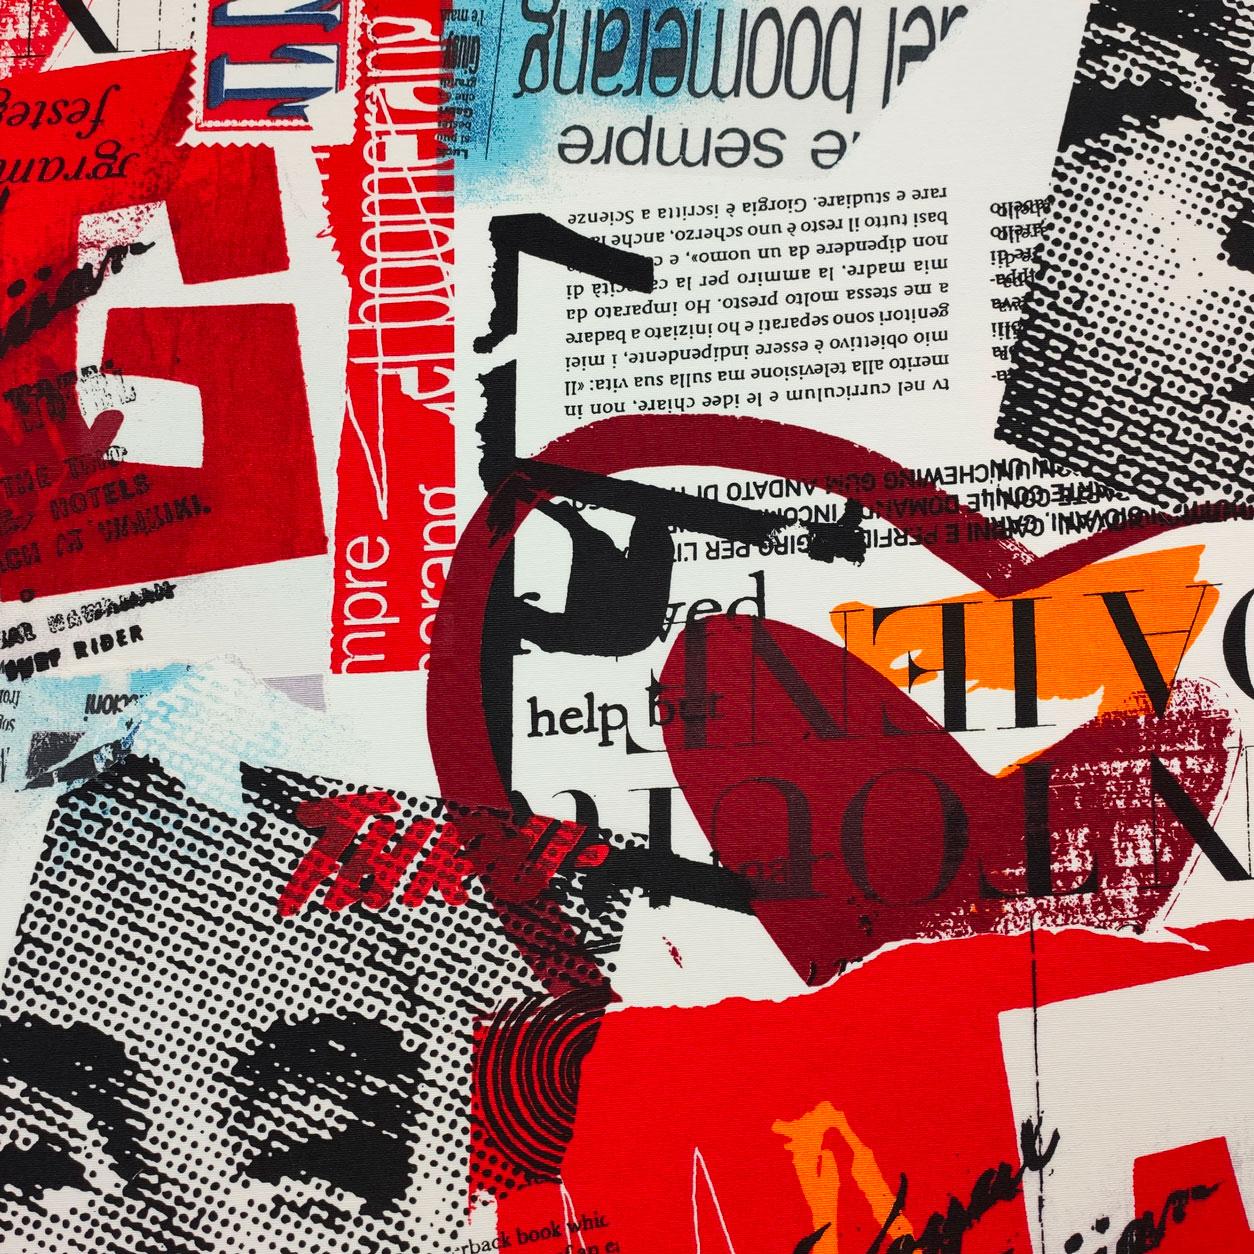 Tessuto Misto Cotone Fantasia Stampa Tipografica